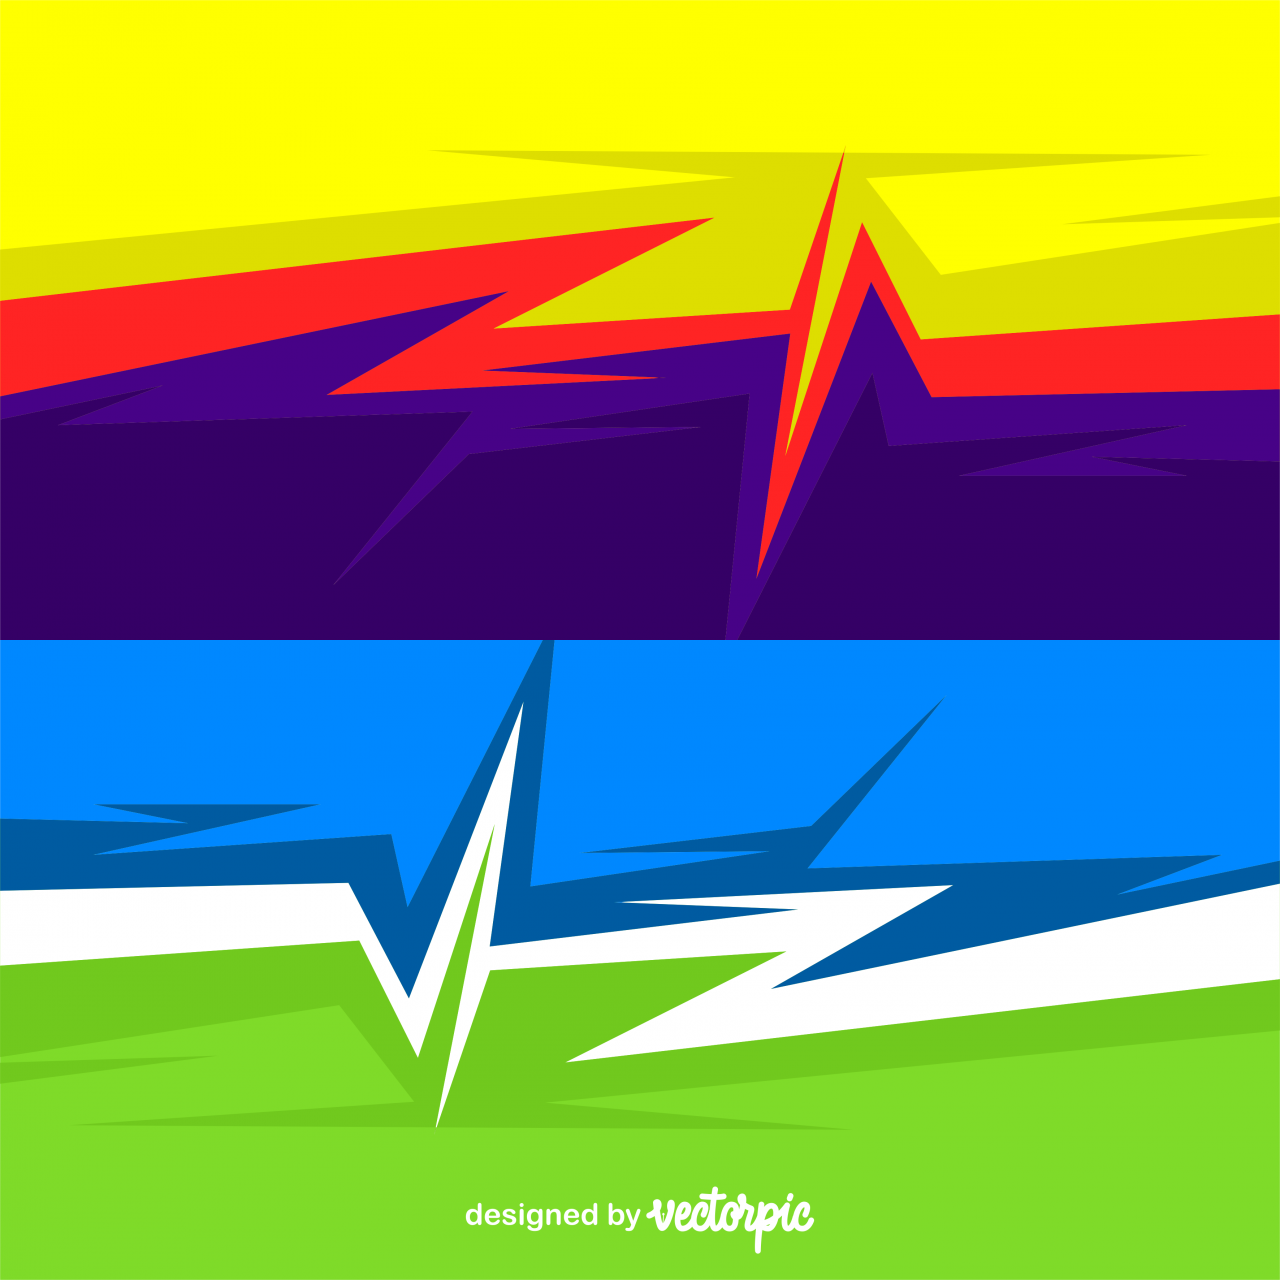 Racing Stripes Streaks Background Free Vector Graffiti Illustration Racing Stripes Graphic Wallpaper